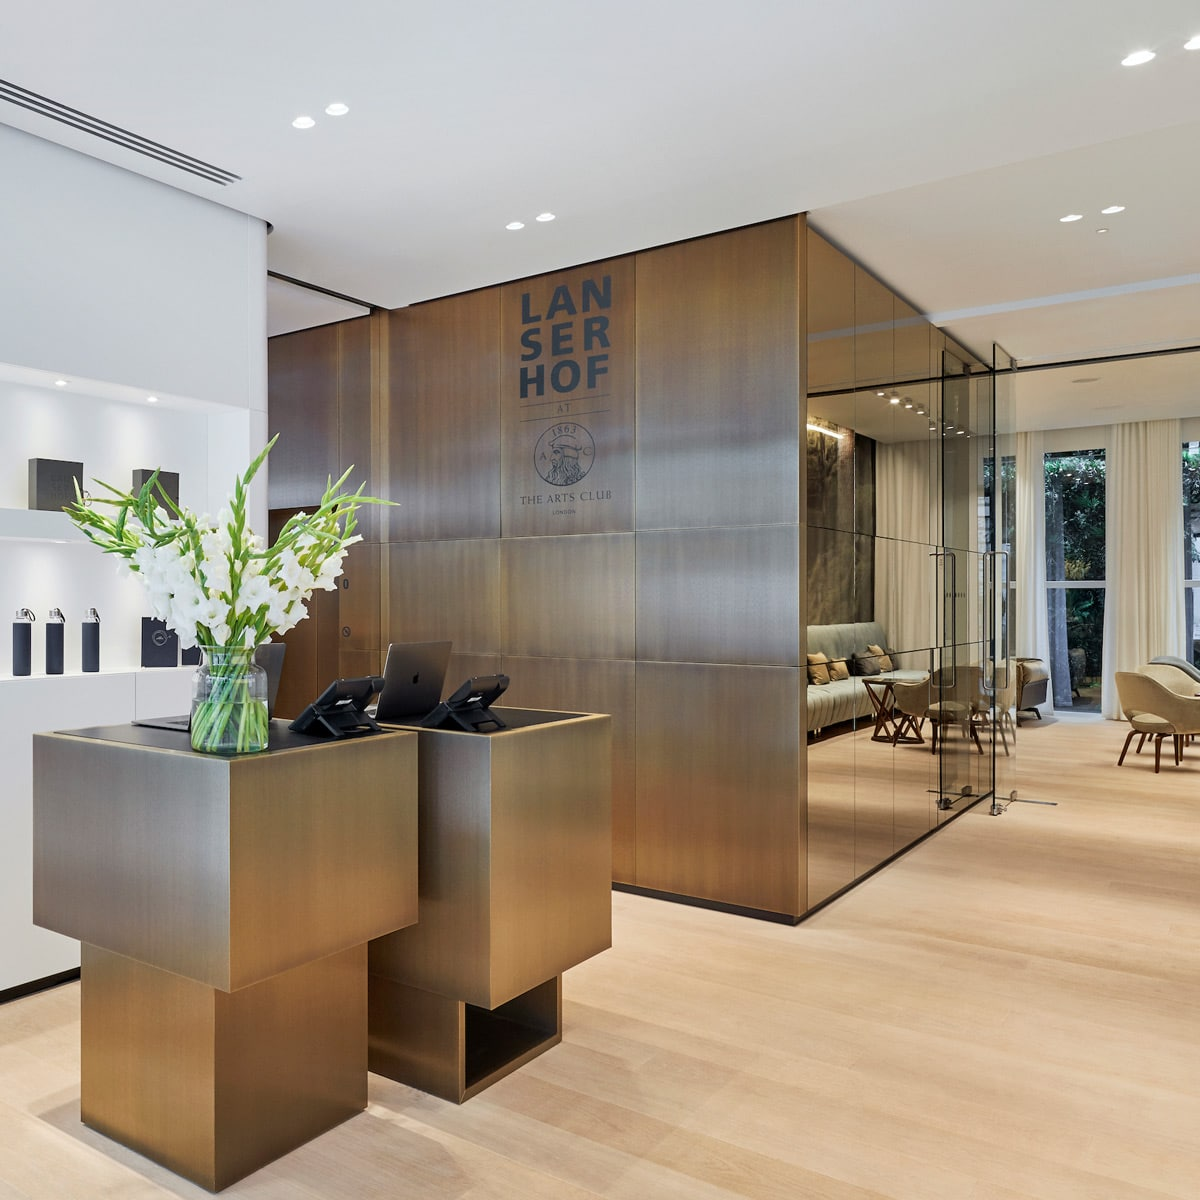 Eingangsbereich des Lanserhof at The Arts Club in London